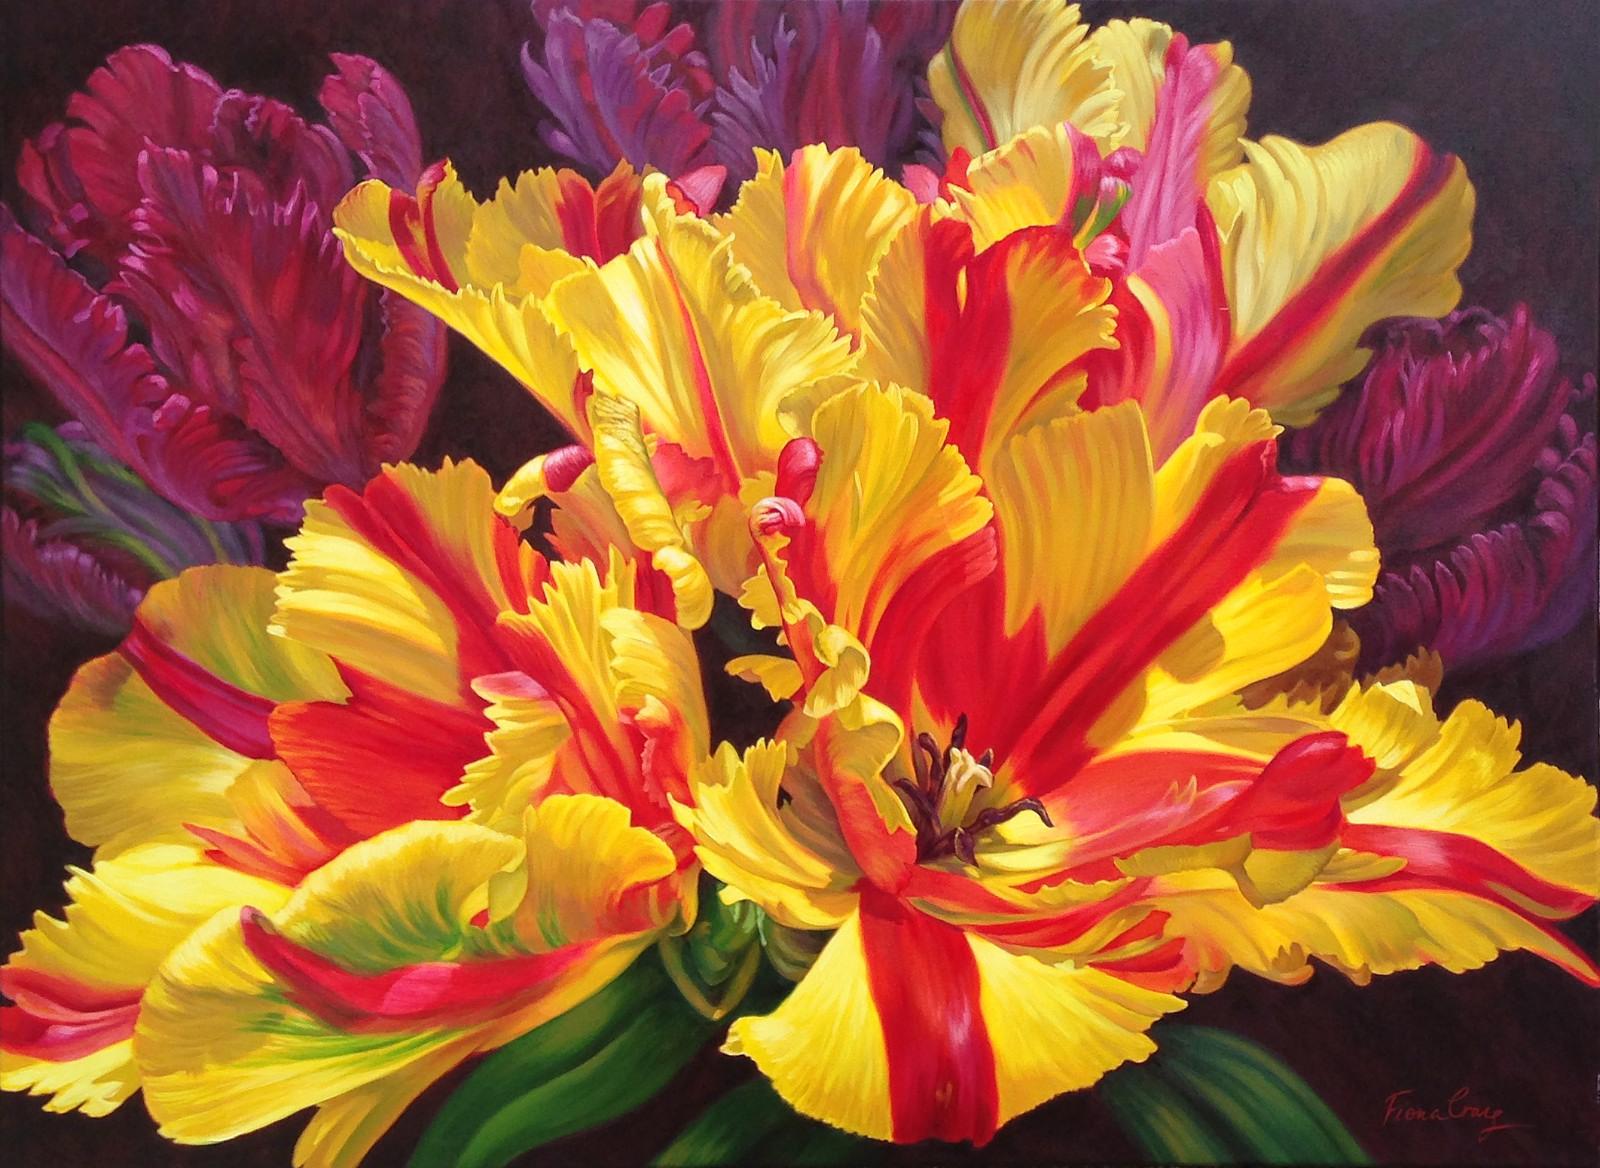 Fiona Craig 'Tulipomania II' 101cm x 137cm #14234